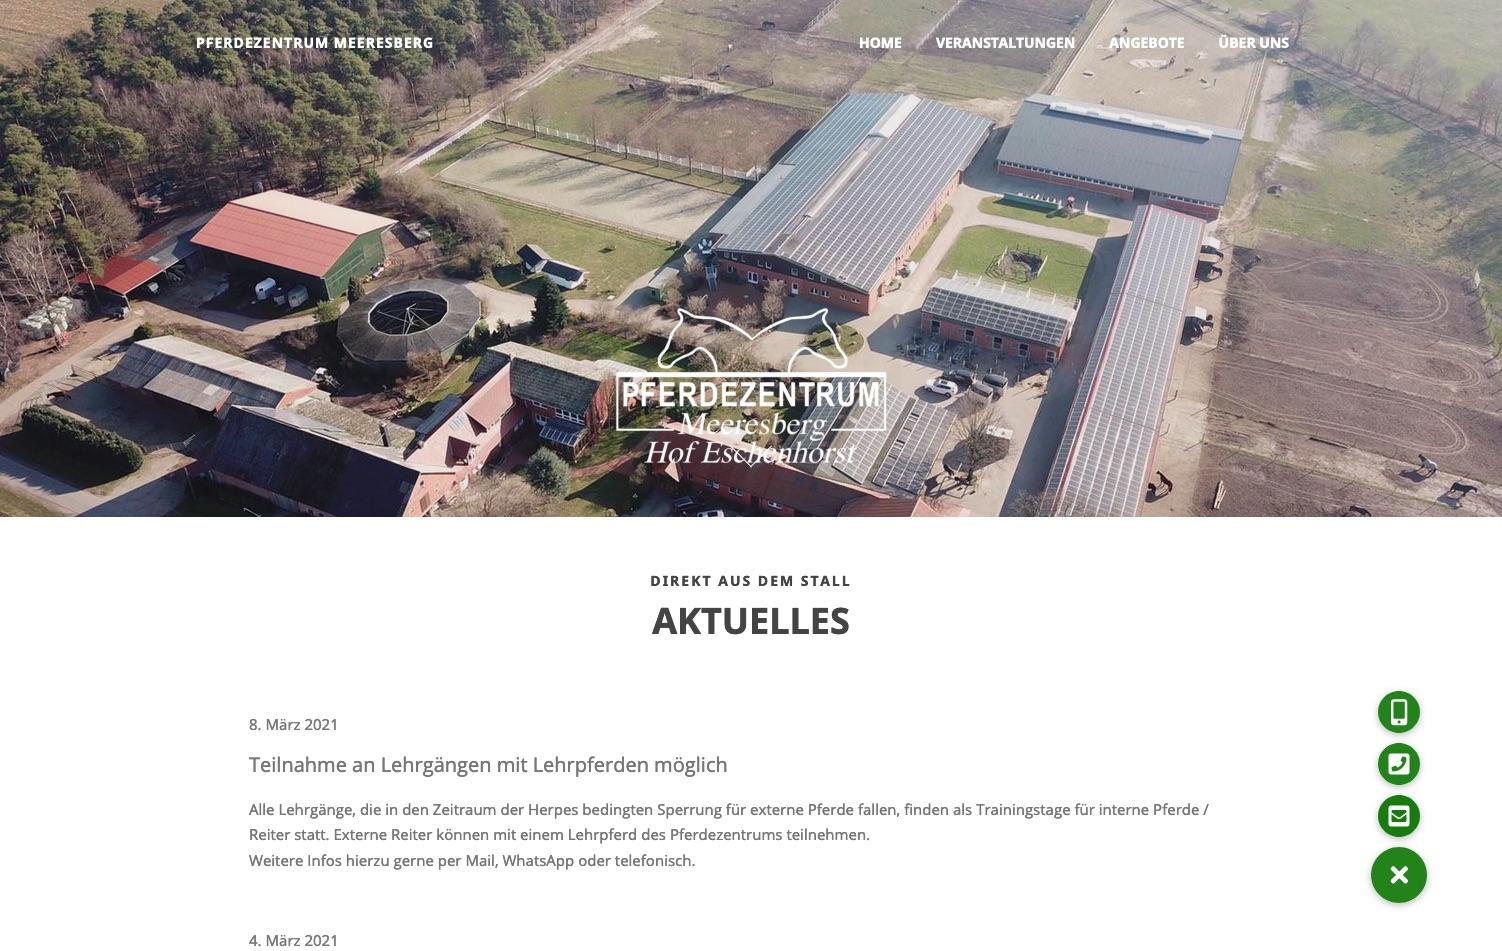 Pferdezentrum Meeresberg - Pensionsbetrieb, Reitschule, Lehrgänge, Trainerausbildung